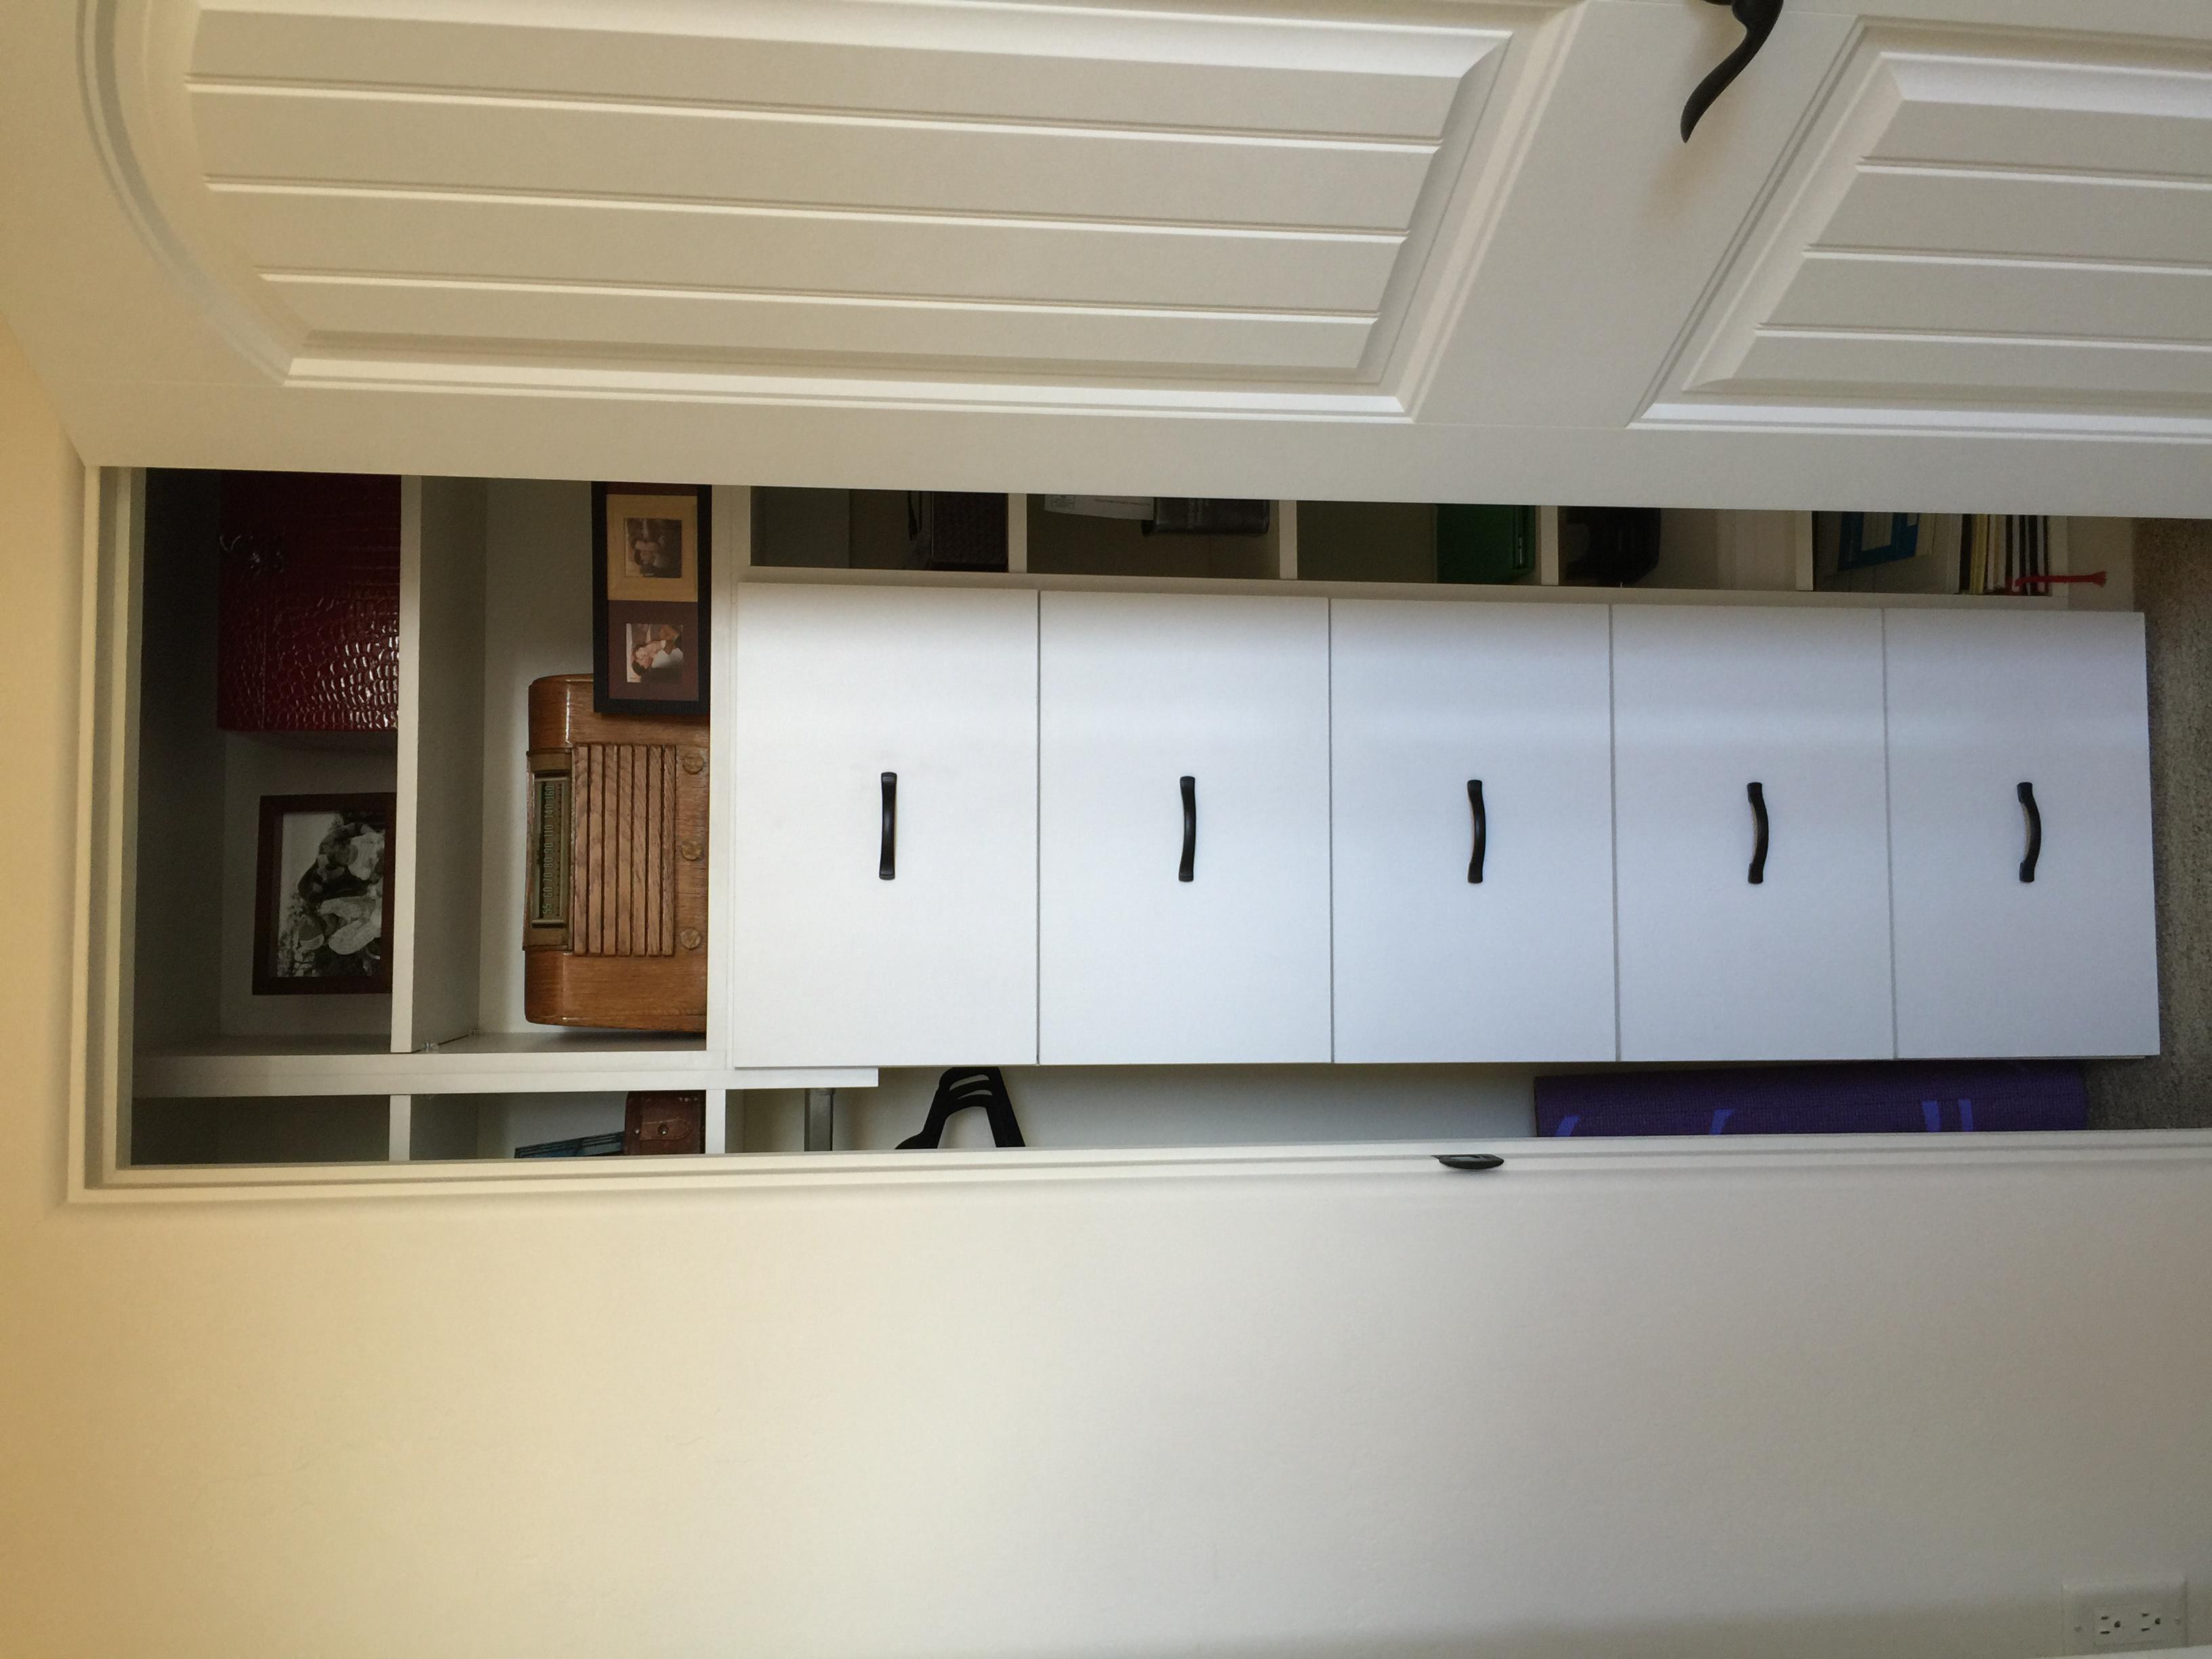 Closet file drawers